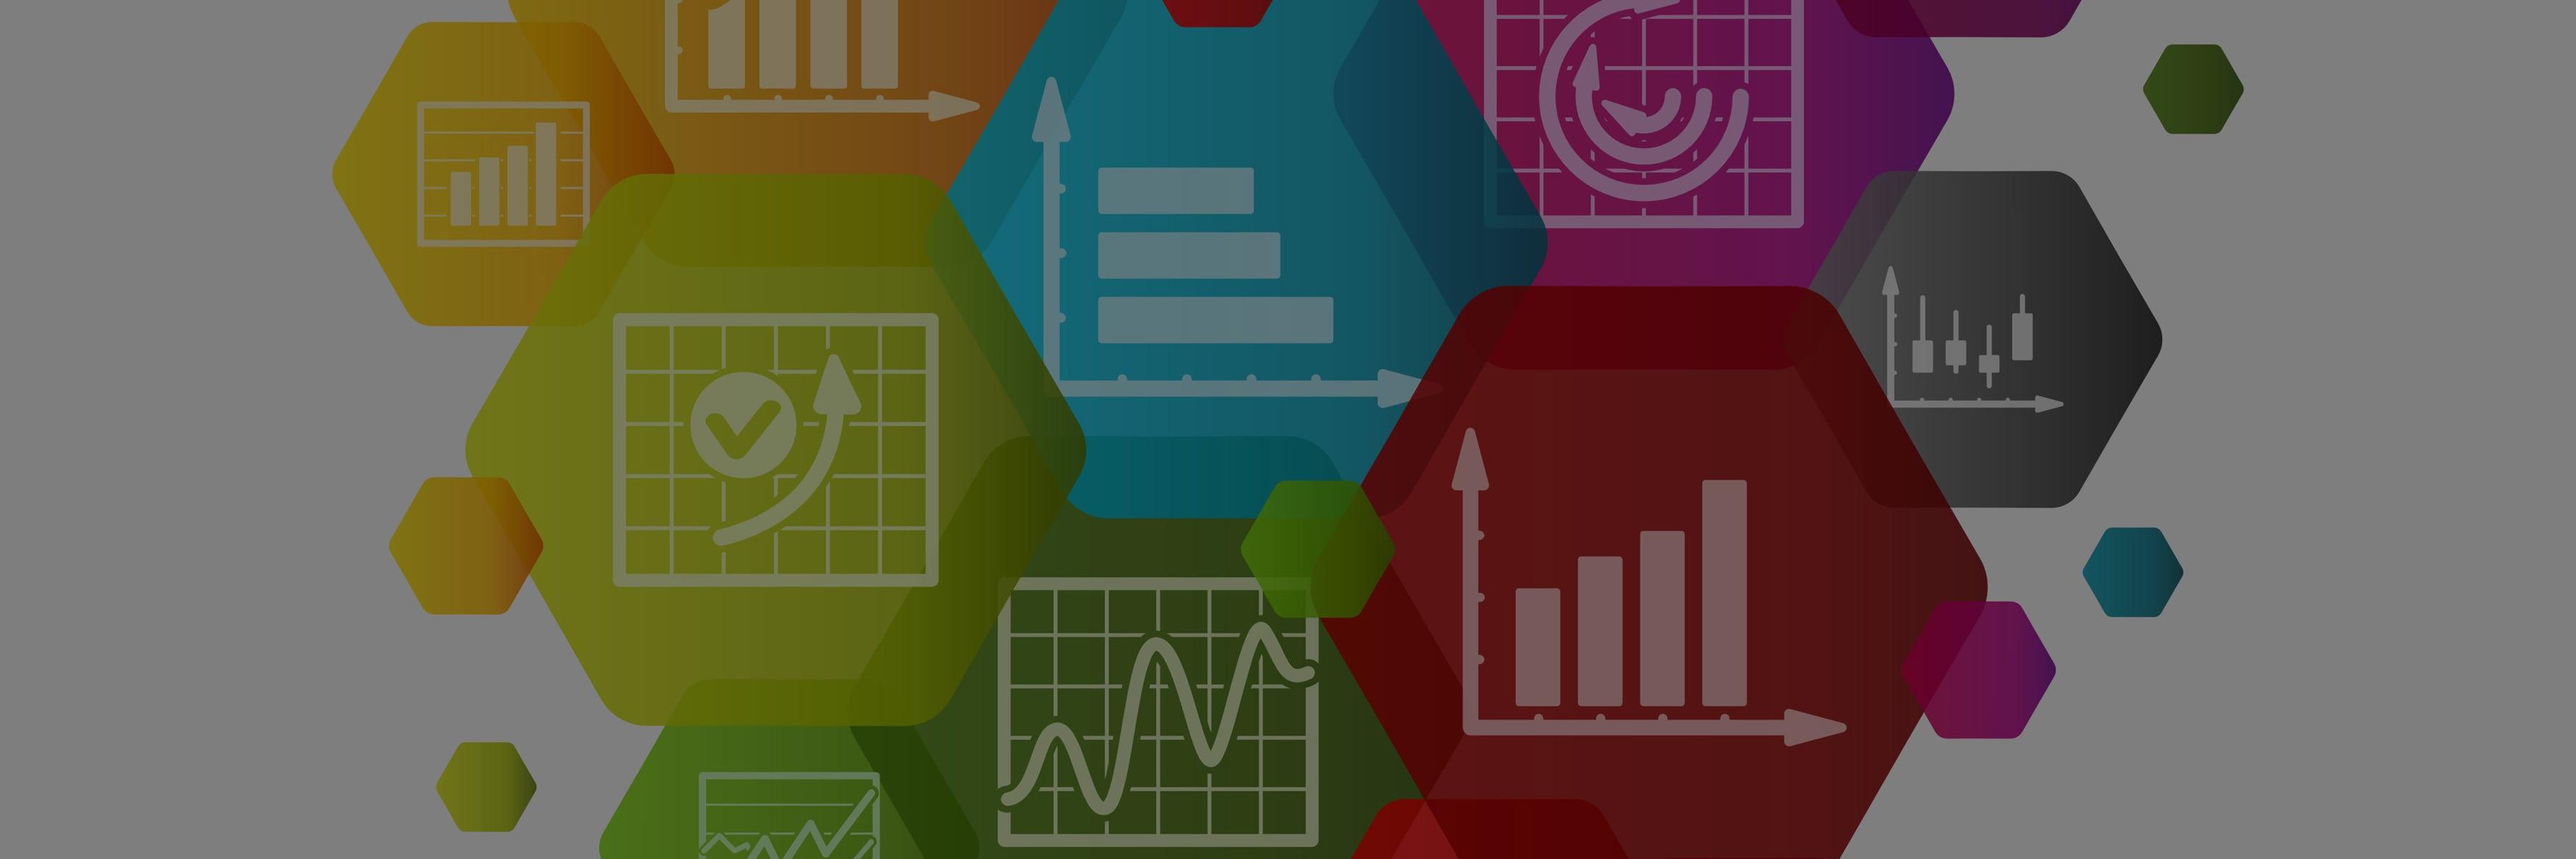 naem-webinar-2015-transforming-ehs-information-management-1800x600-min